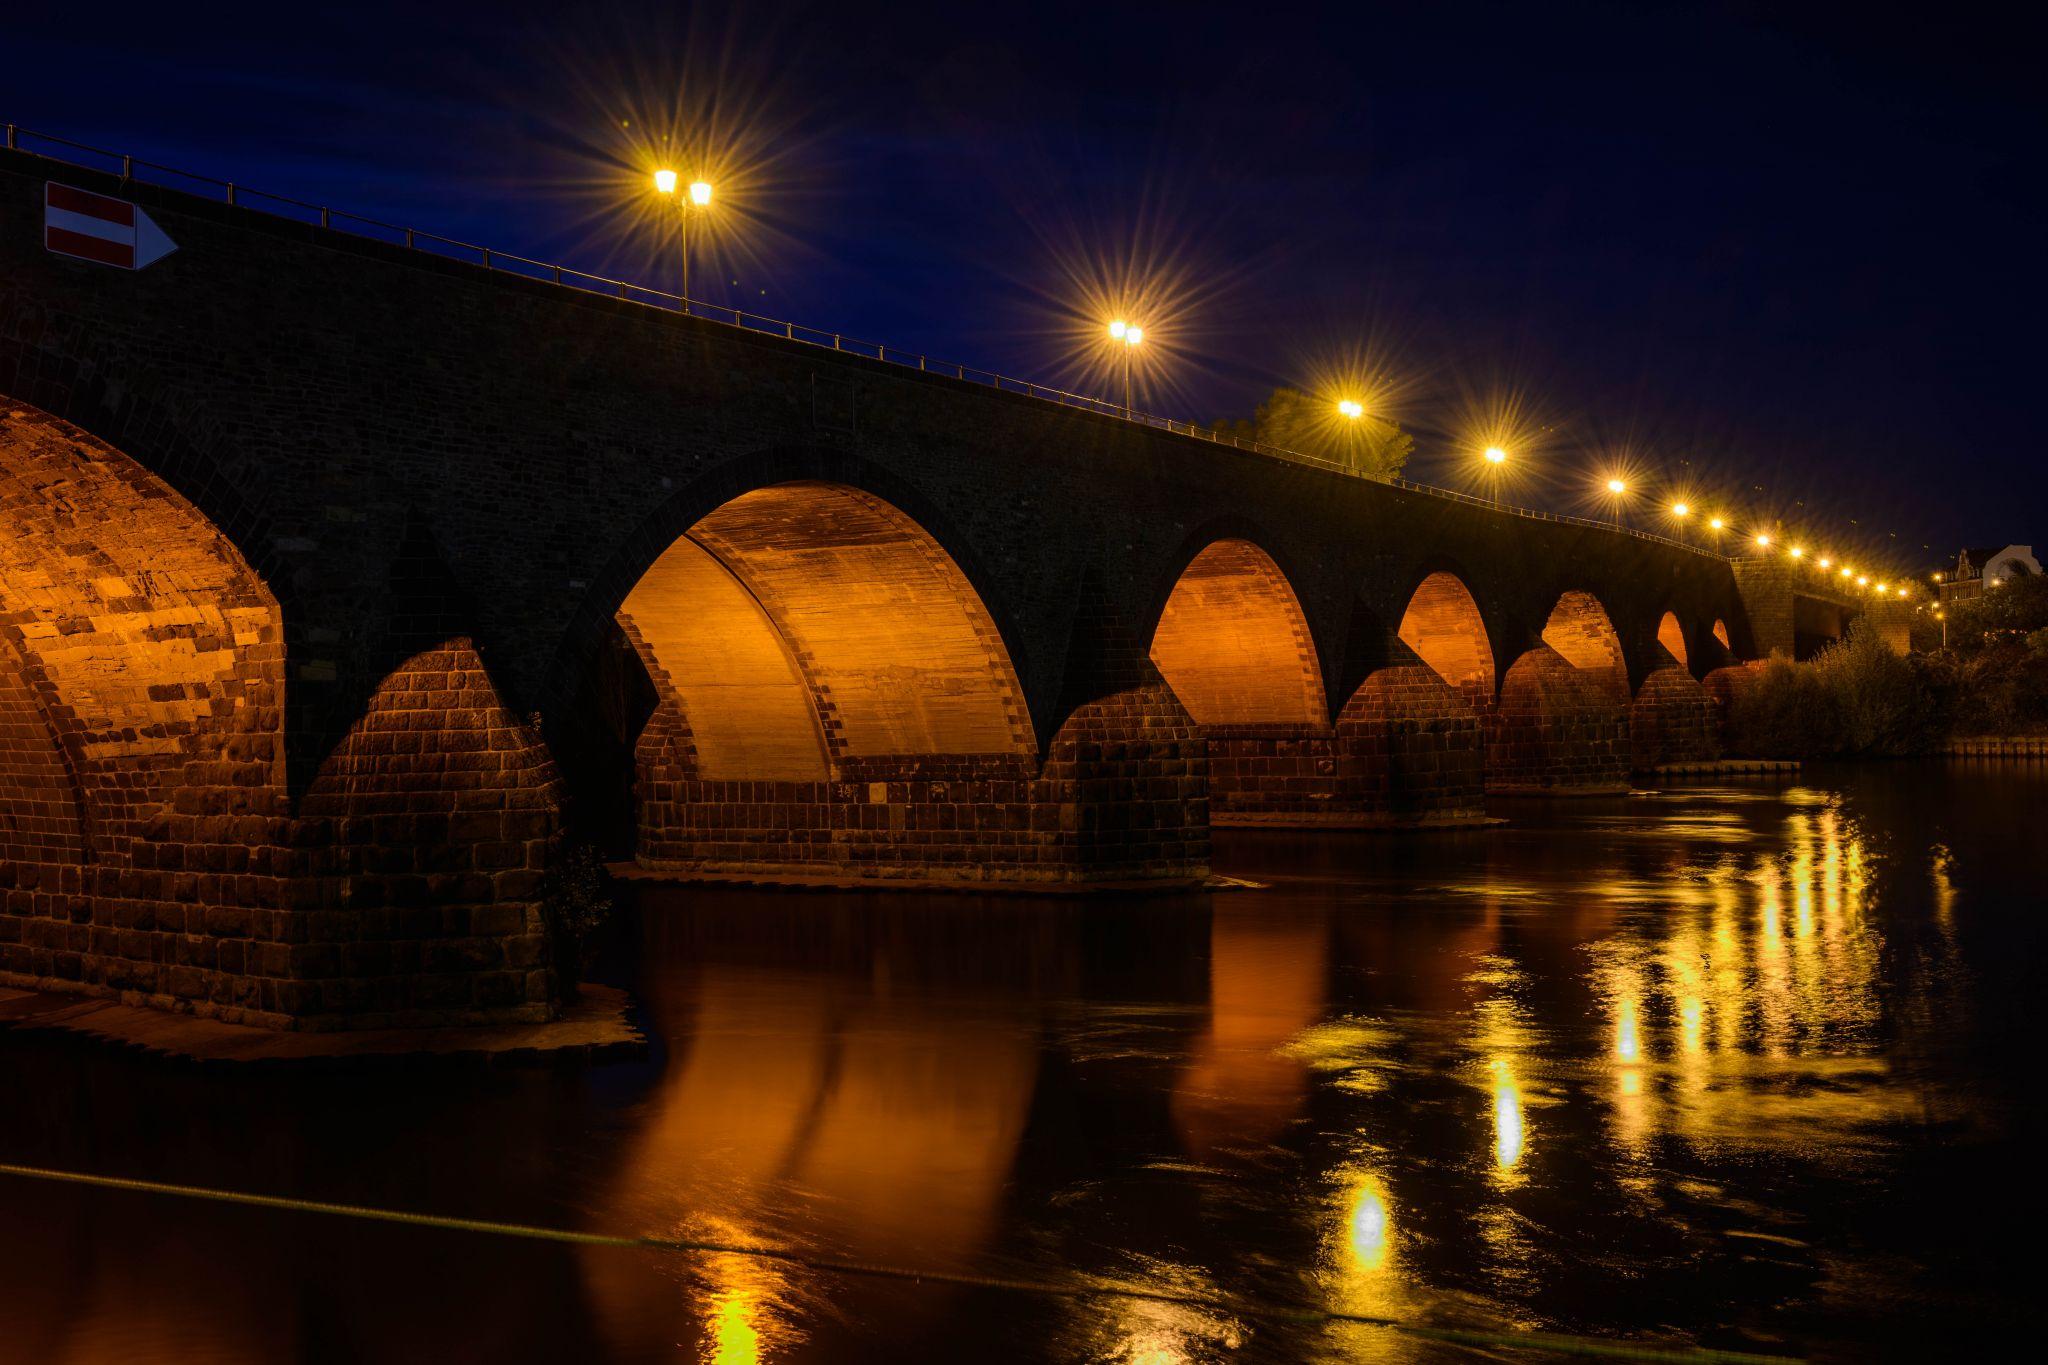 Balduin-Bridge, Germany